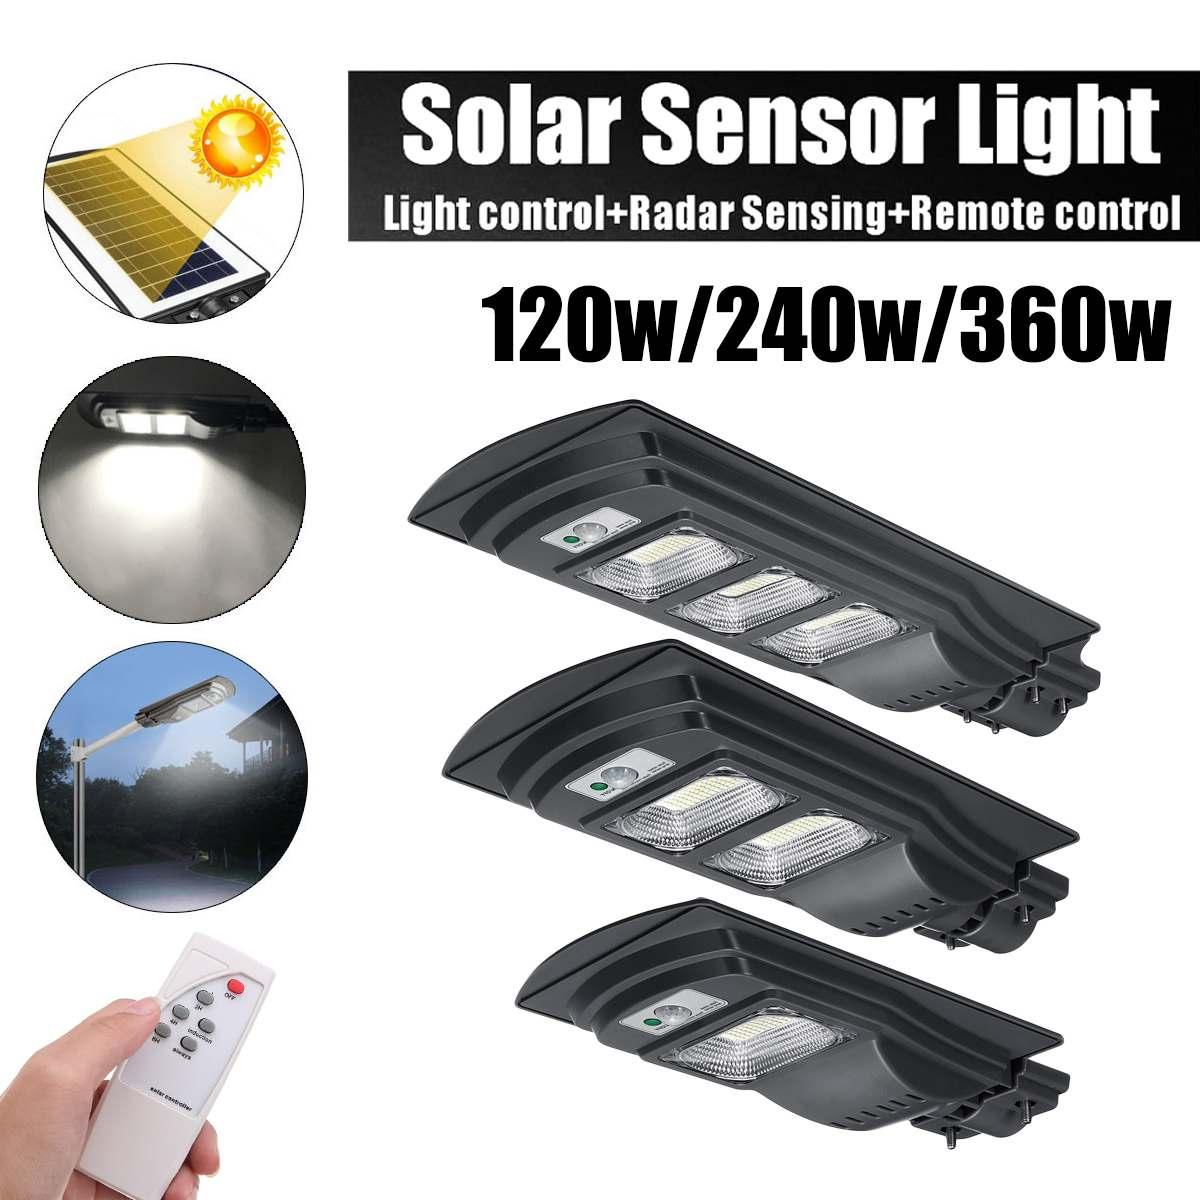 Smuxi  Solar Street Light  Radar Motion 360W/240W/120W LED Gray IP65Constantly Waterproof Induction Solar Sensor Remote Control